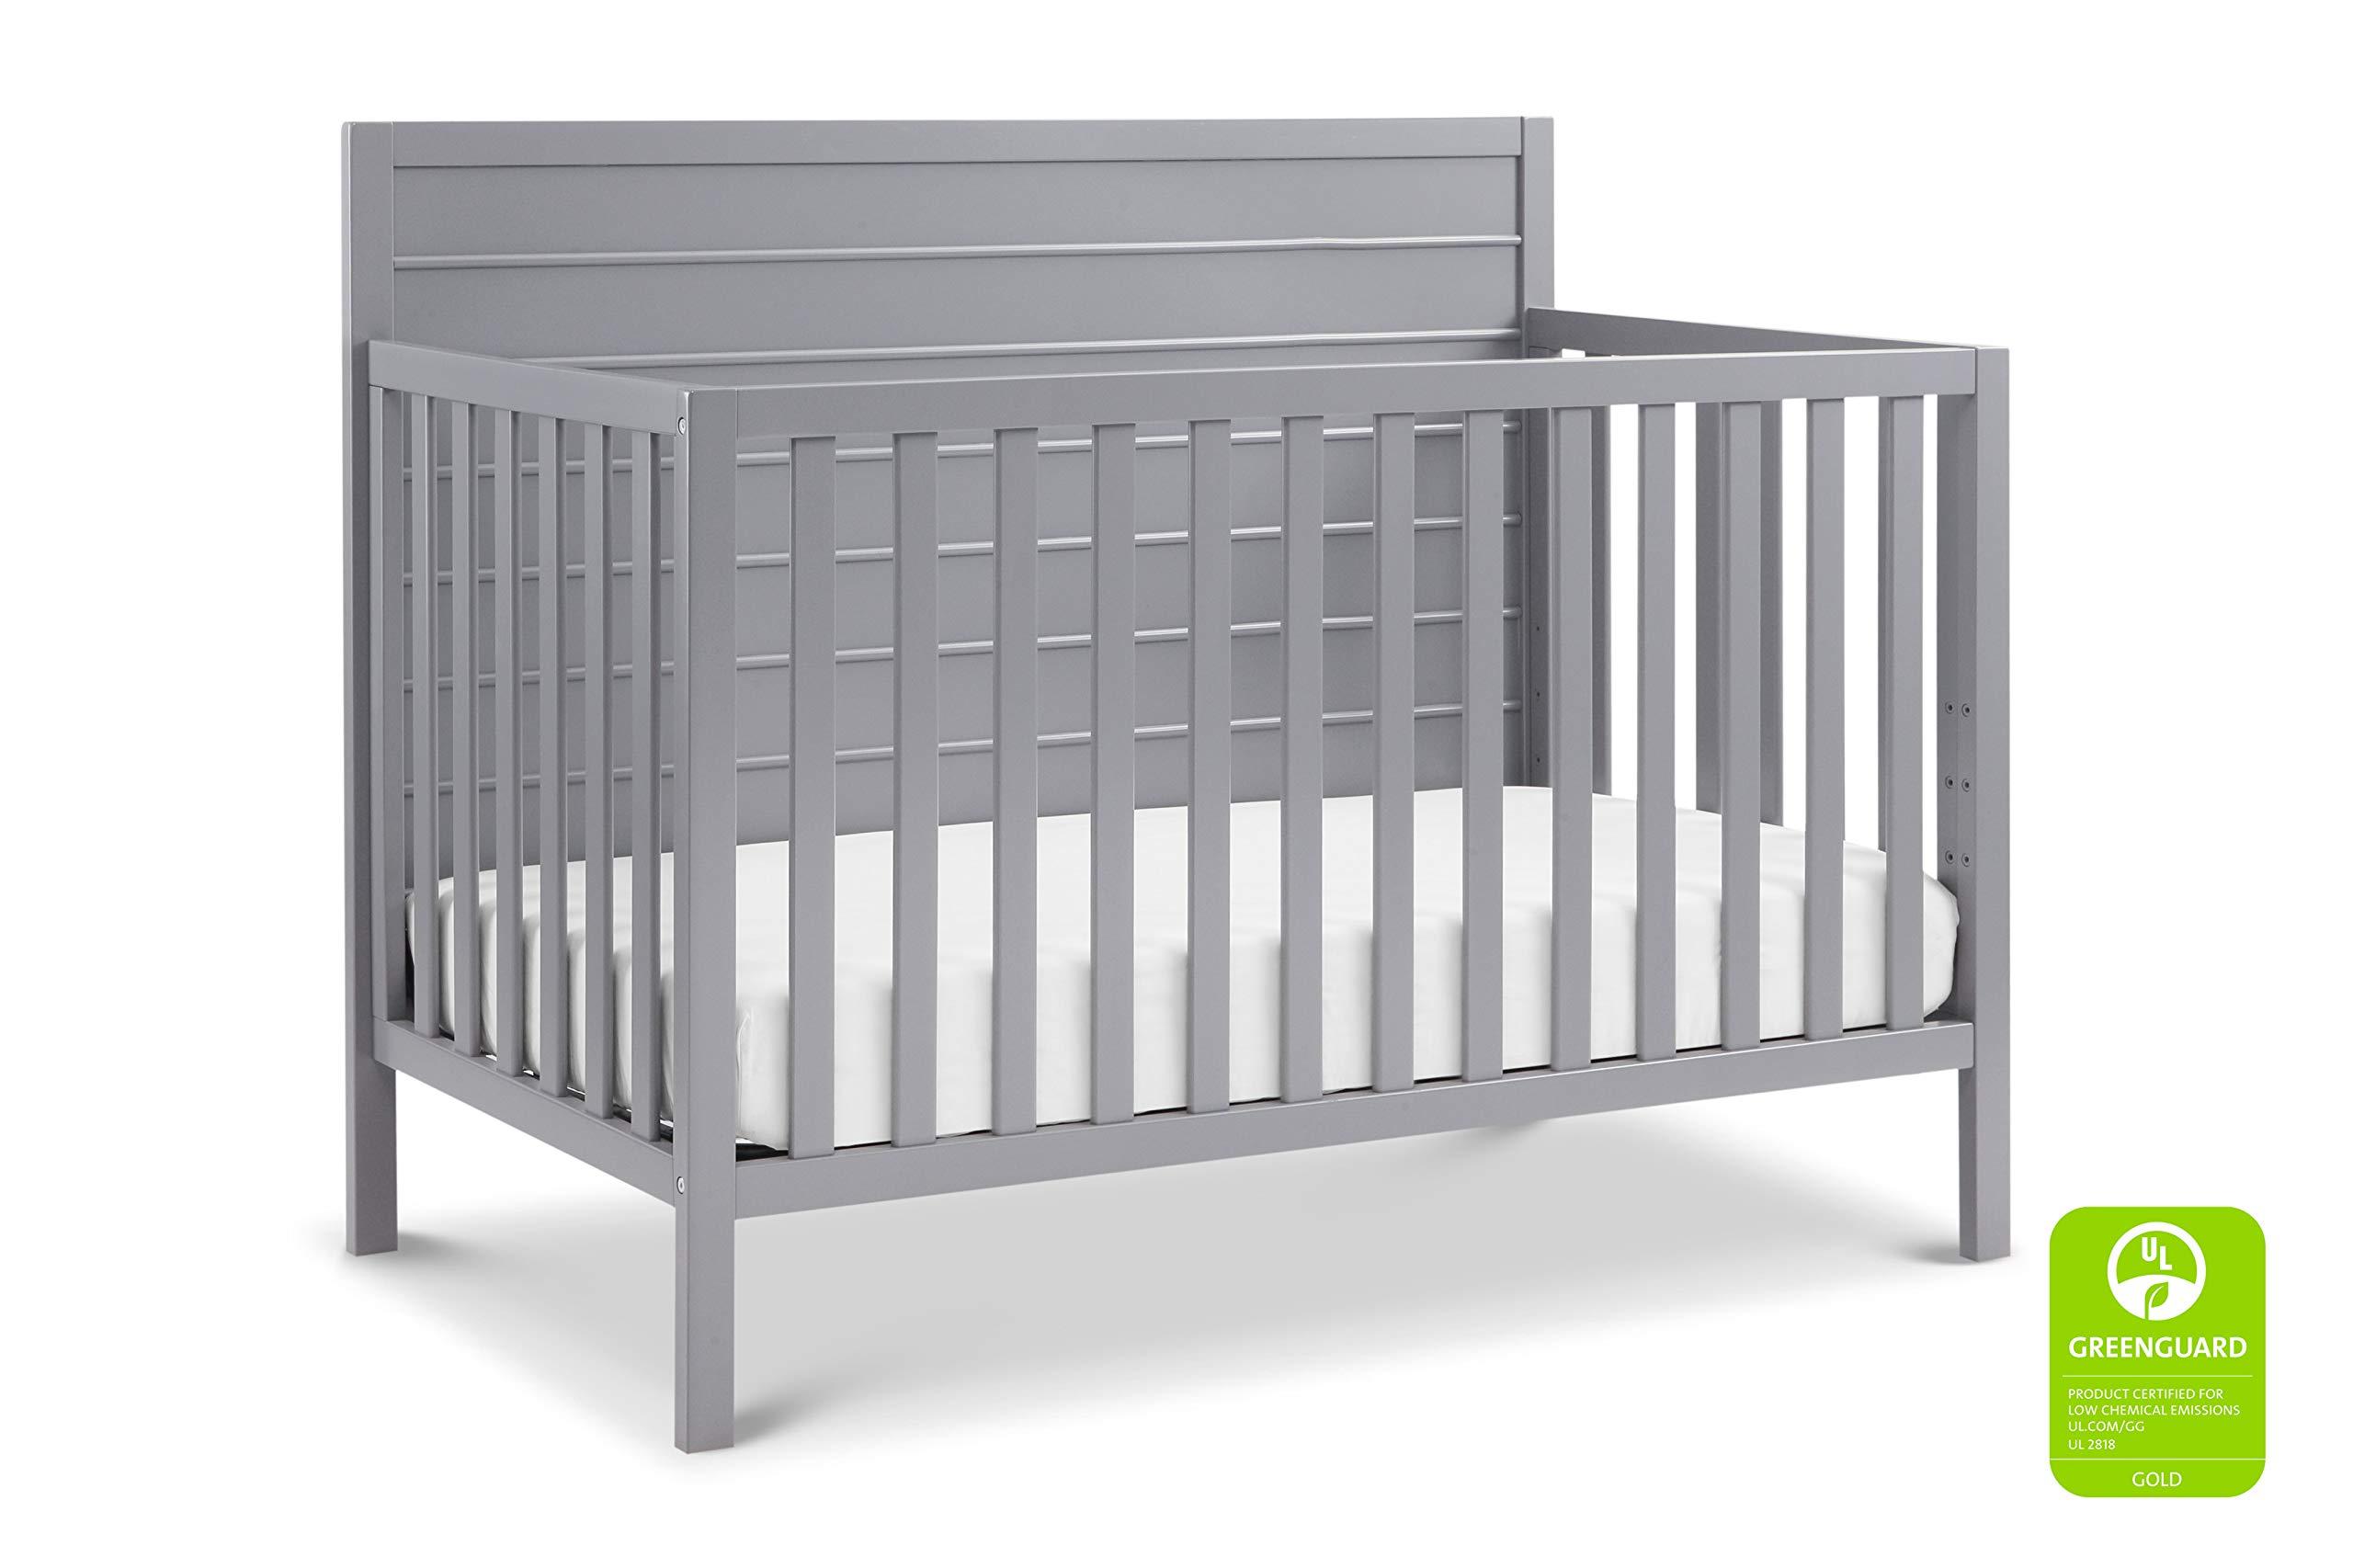 Carters DaVinci Morgan Convertible Crib